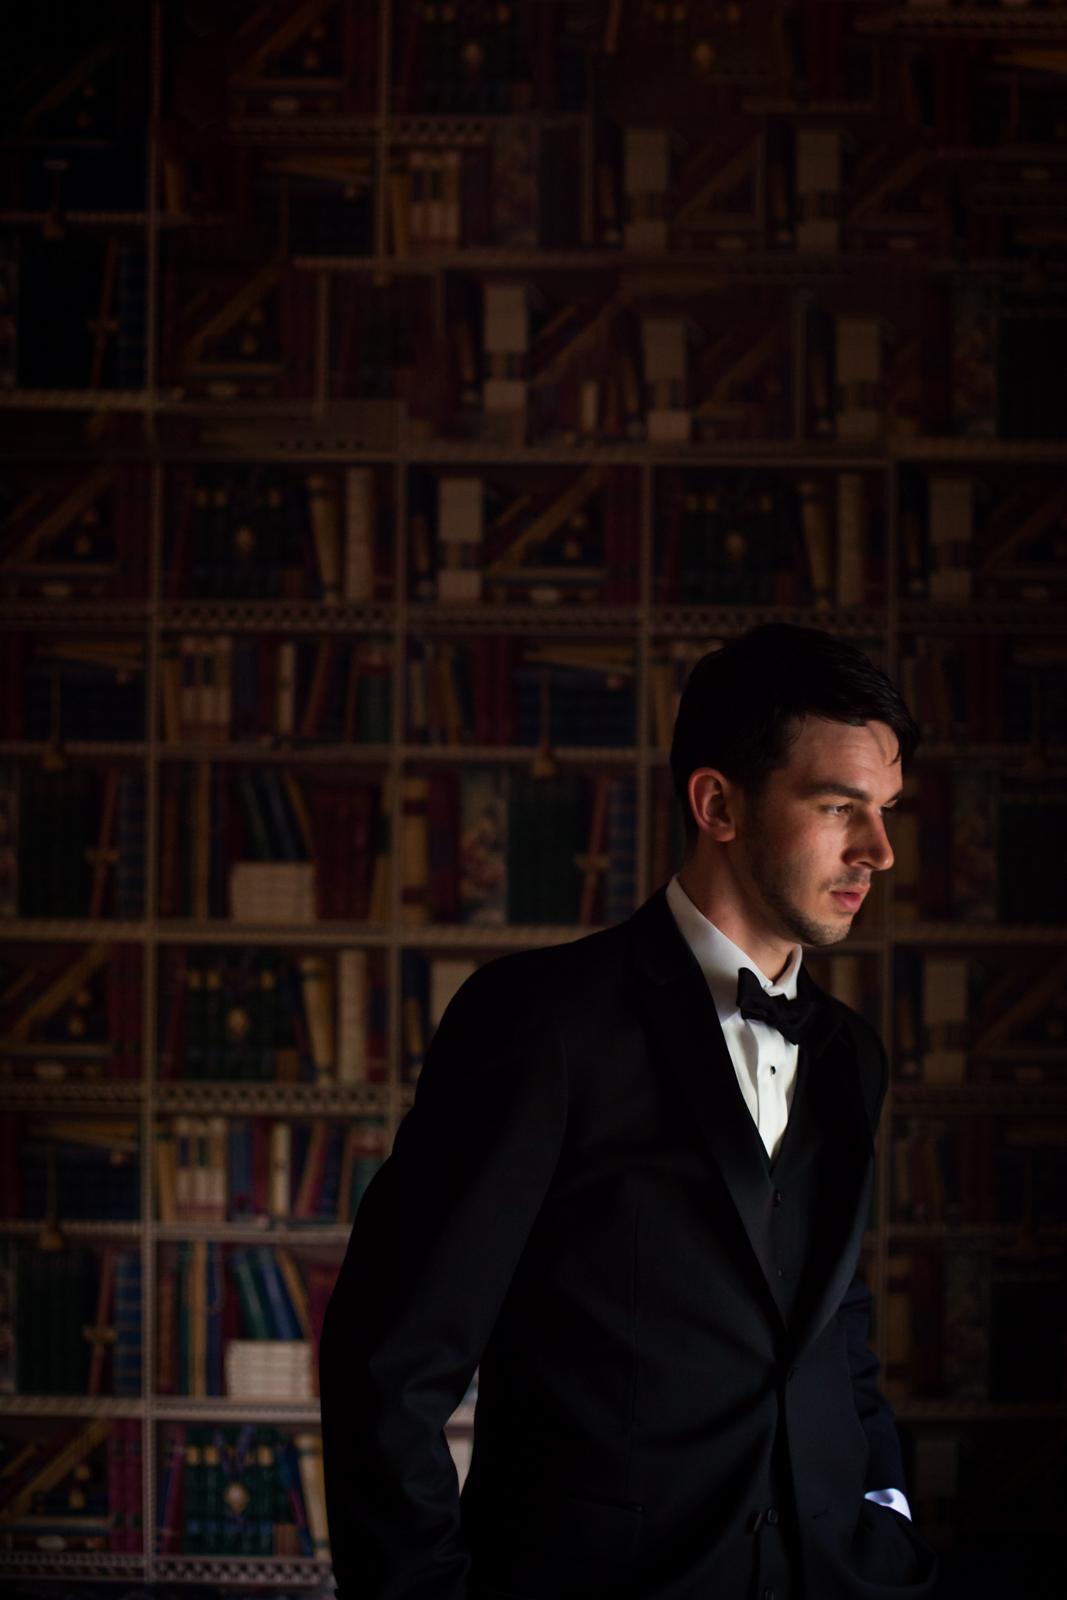 naperville-wedding-photography-37.jpg